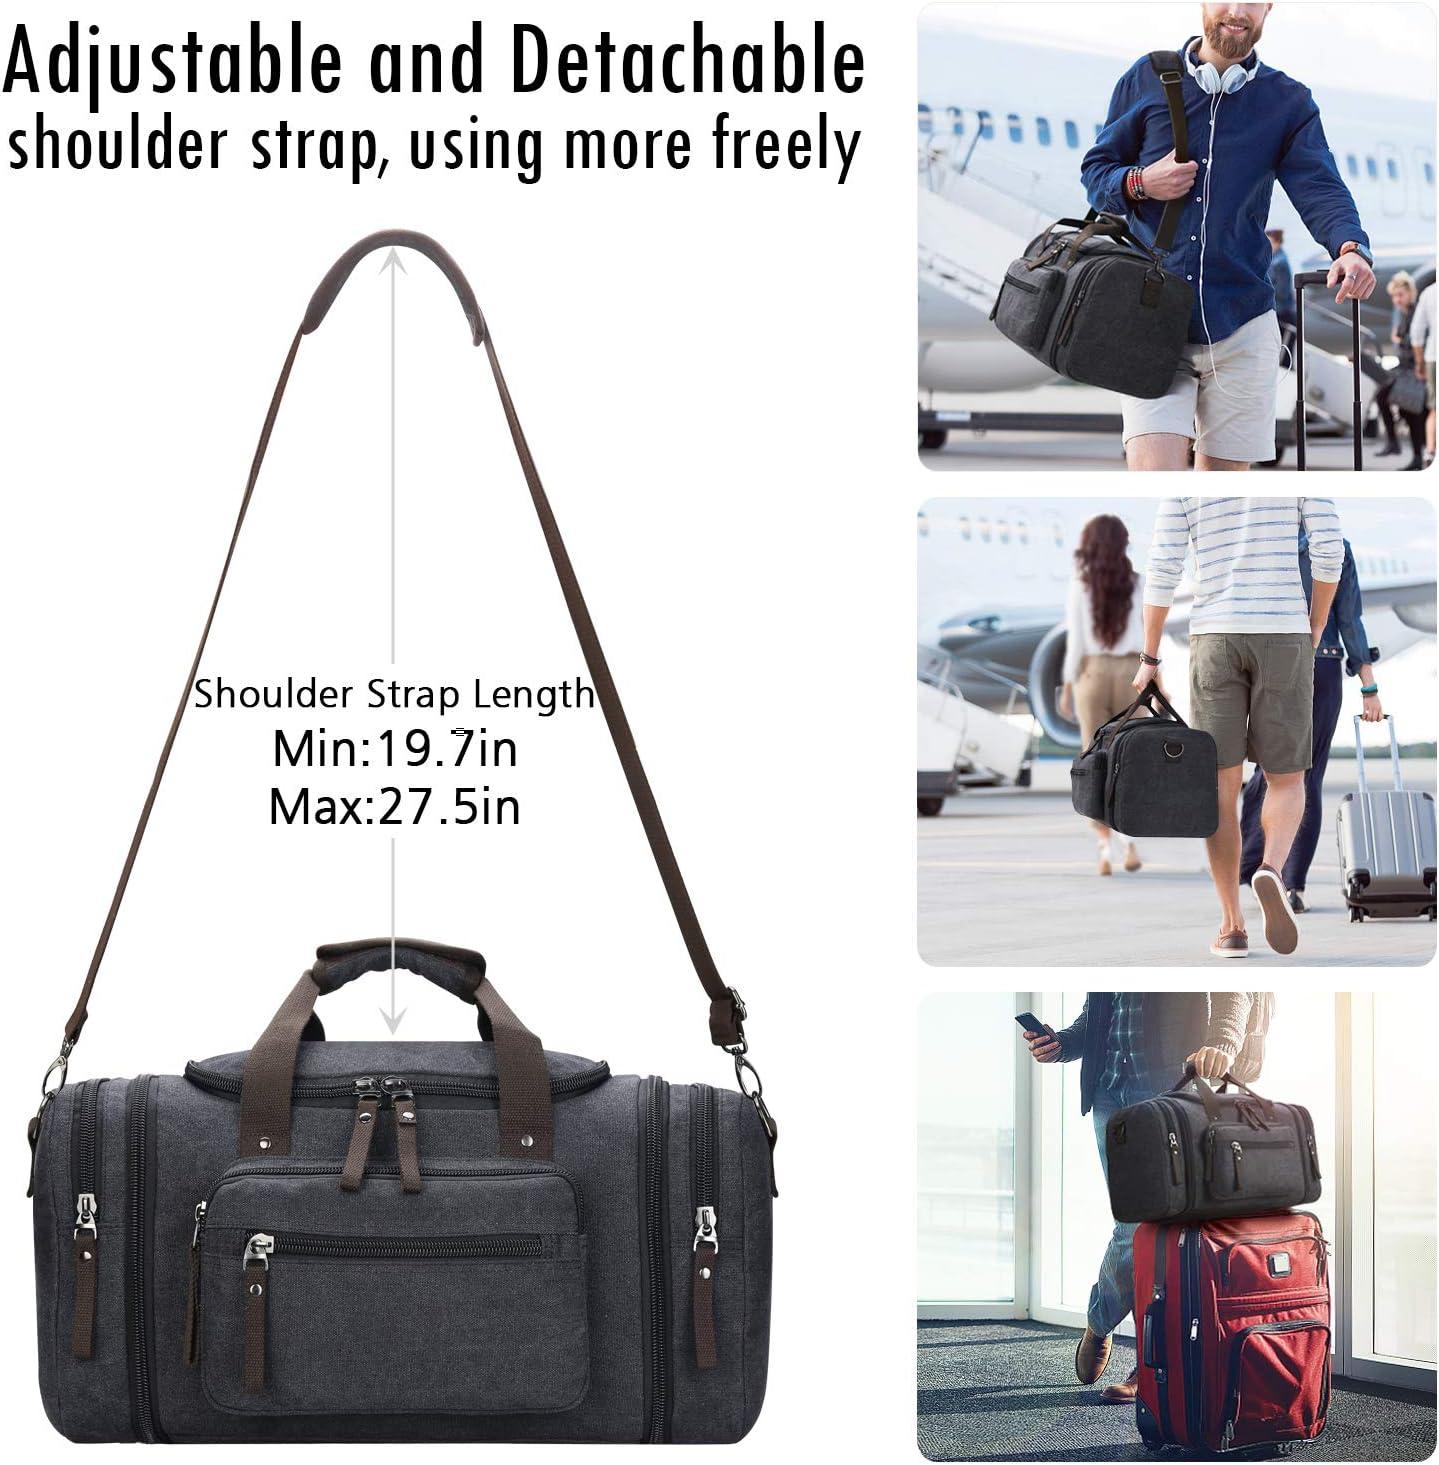 Wang5995 Canvas Travel Large Capacity Handbag Single Shoulder Cross Multi Function Luggage Bag Travel Boutique Color : Coffee Color